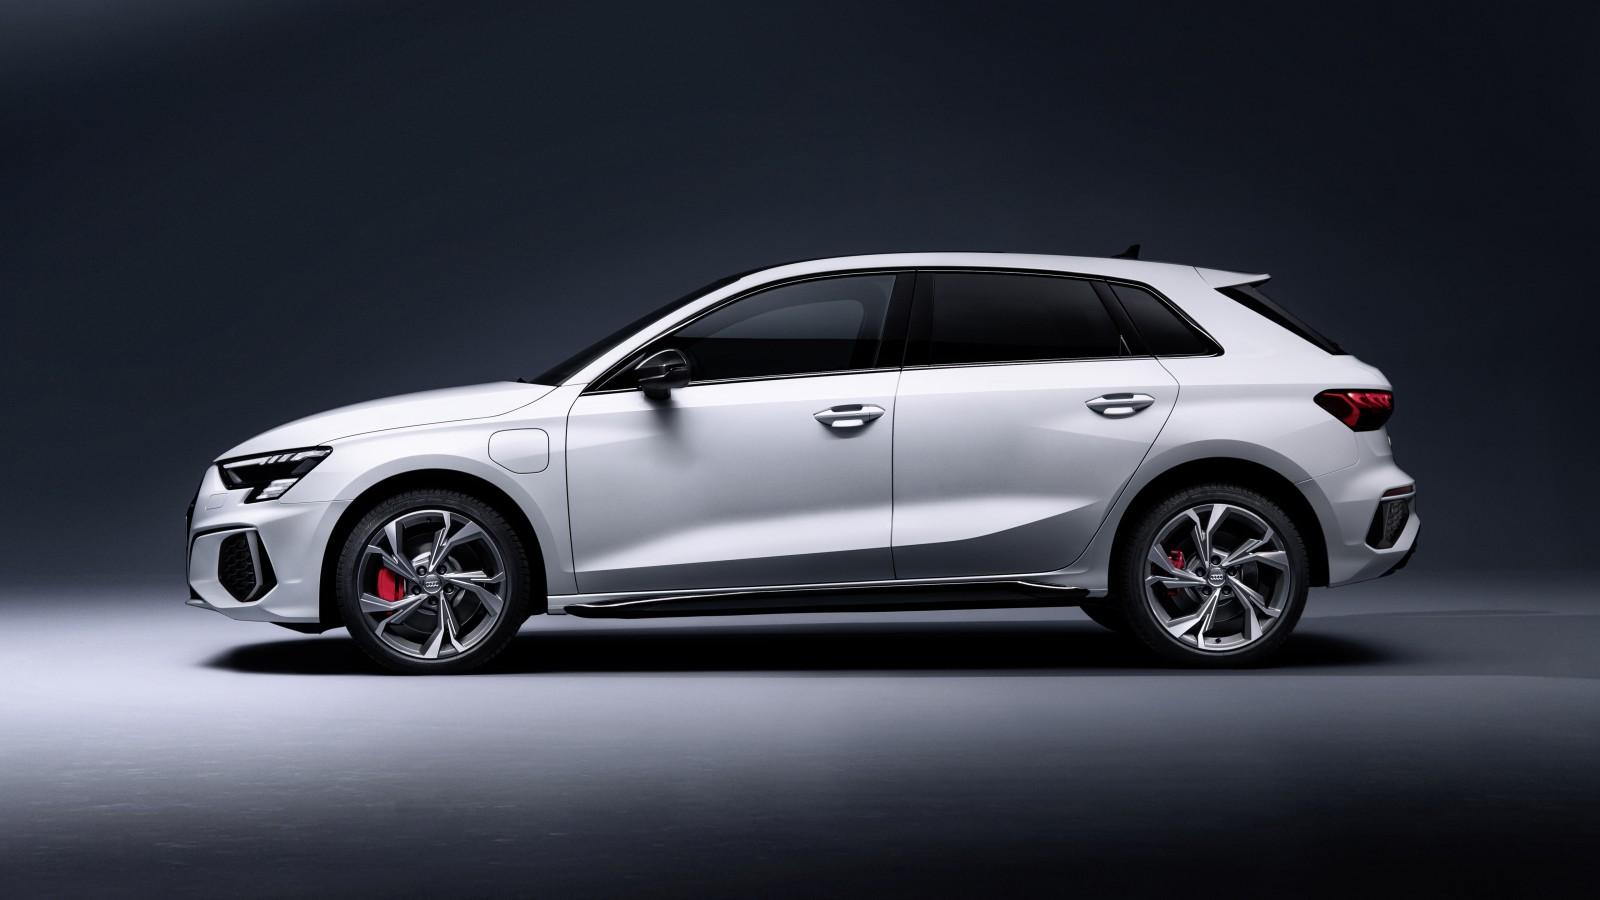 Audi A3 Sportback 45 TFSI e S line 2021 5K 2 Wallpaper ...